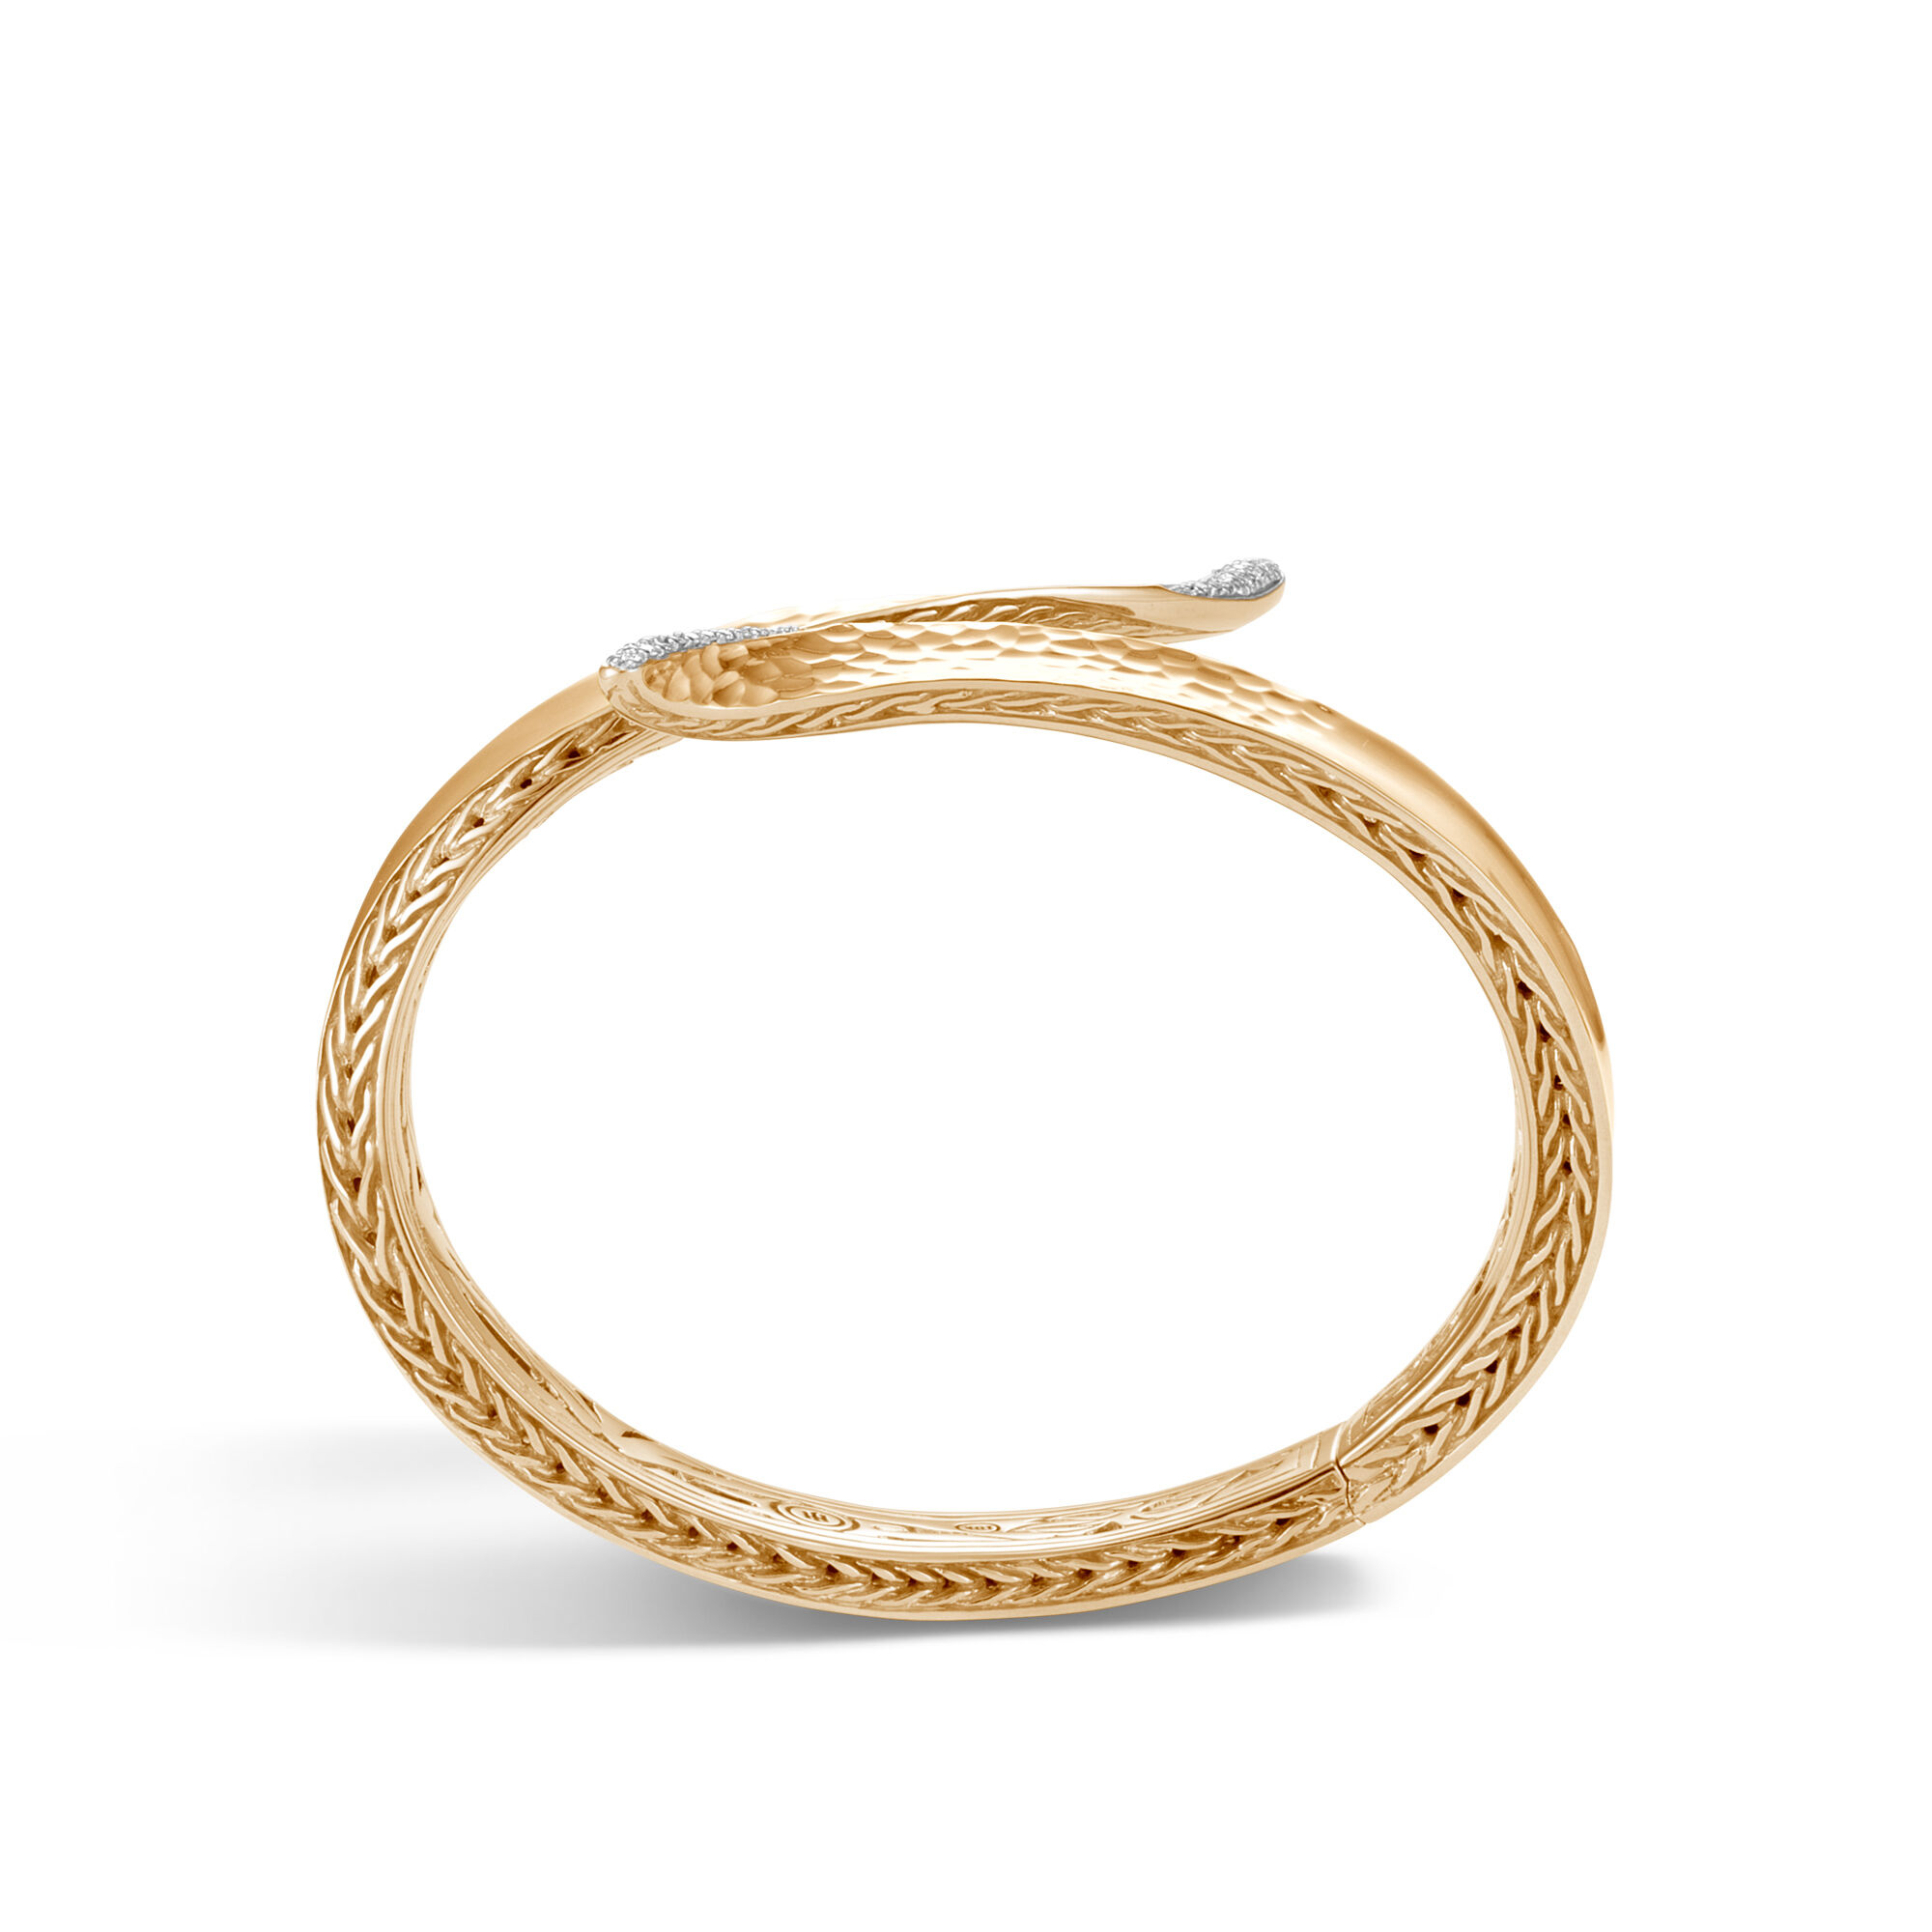 John Hardy 18k Gold Classic Chain Hammered Wave Hinged Bangle 51J4VjOI